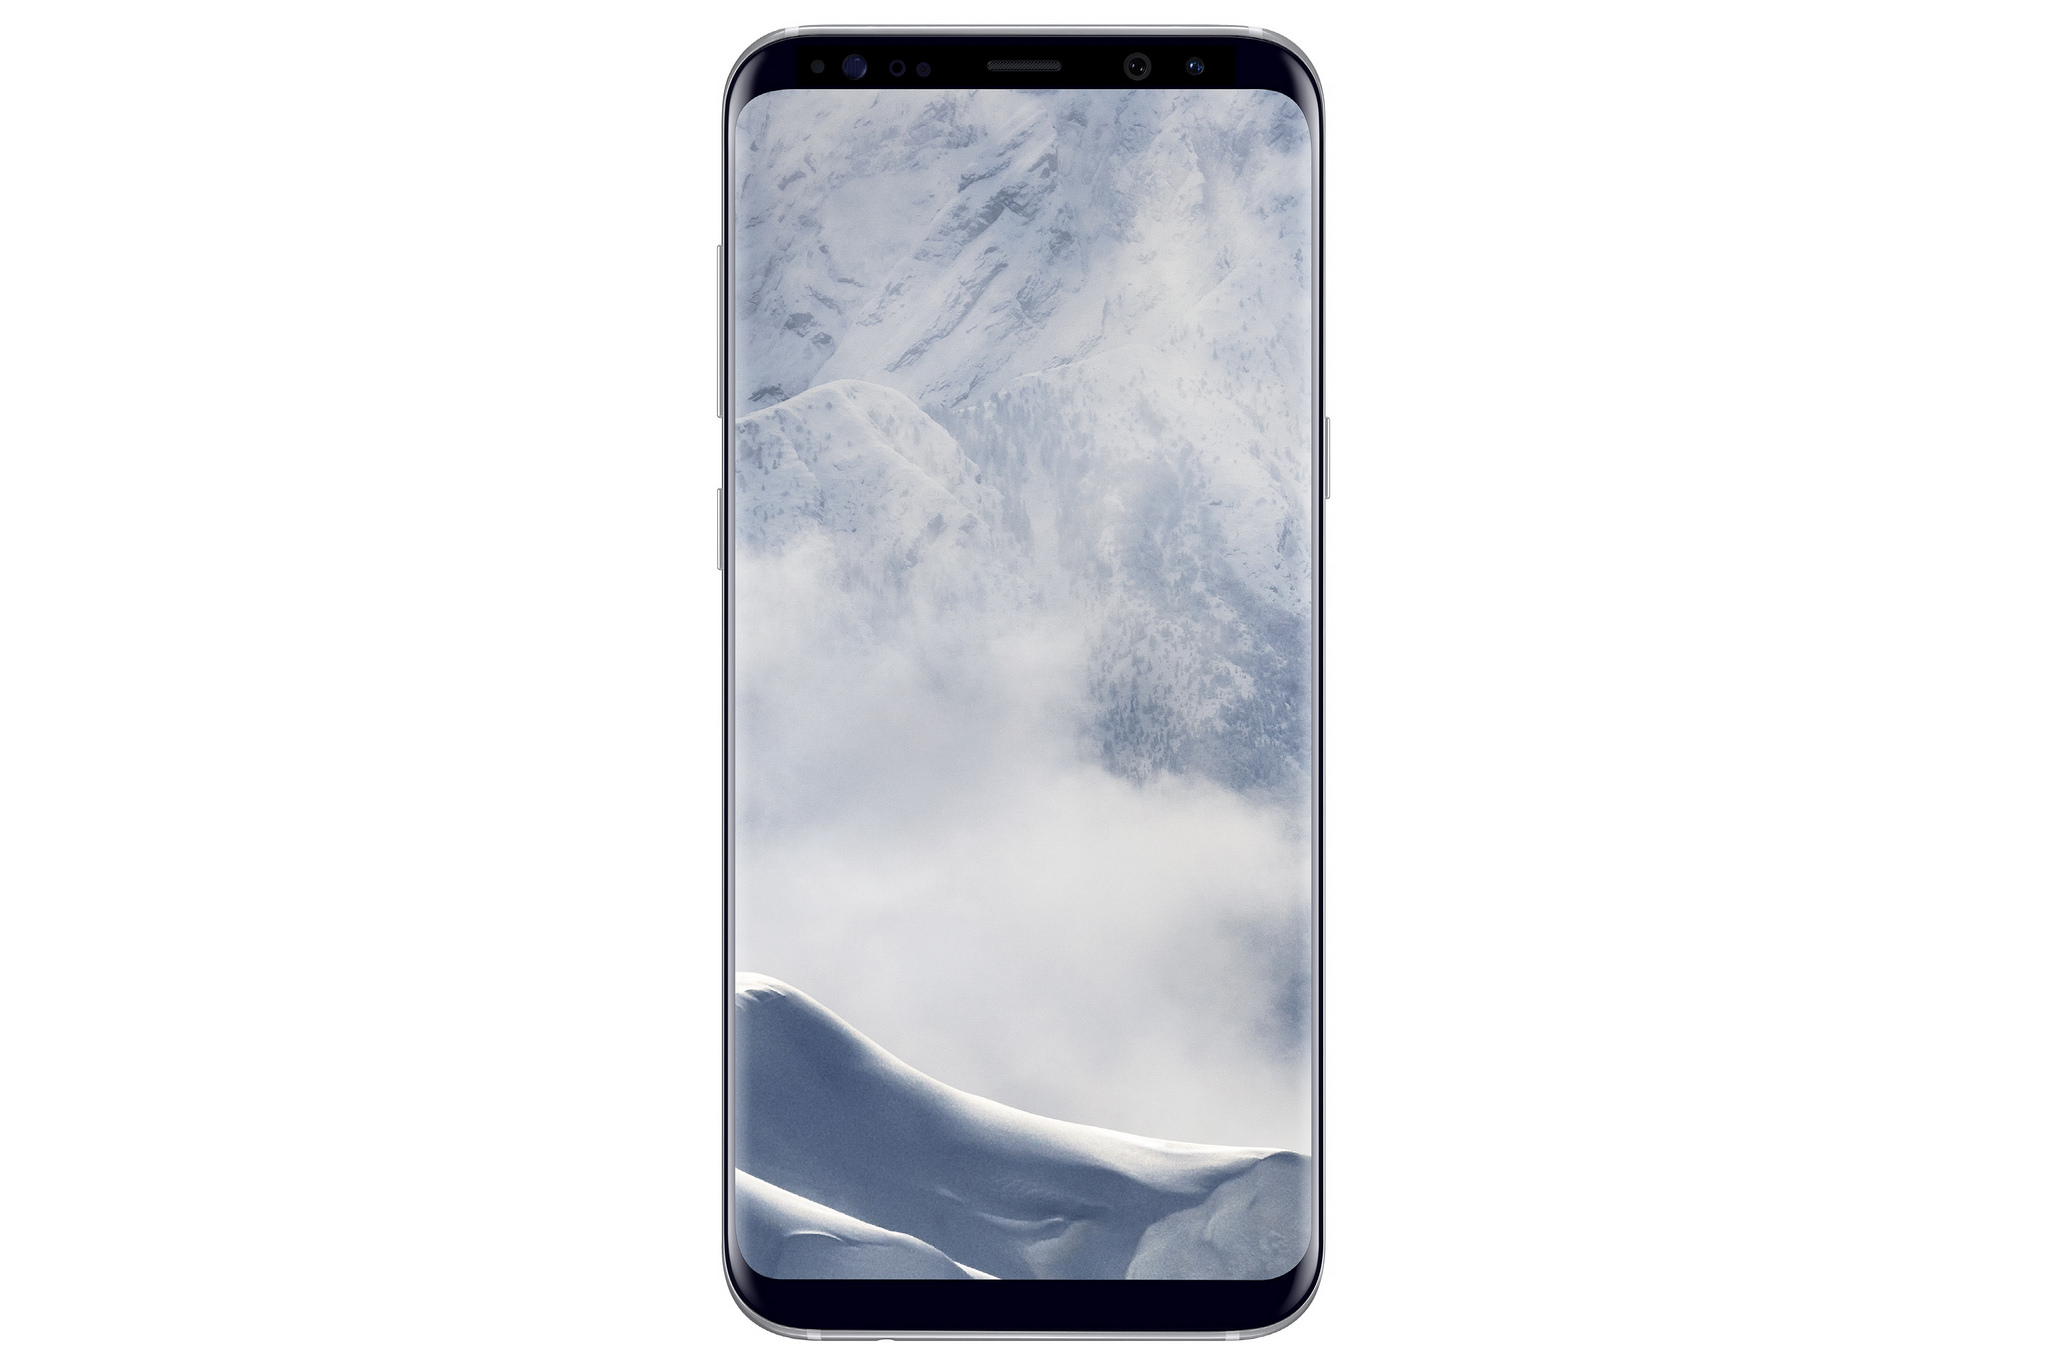 Samsung Galaxy S8 official display